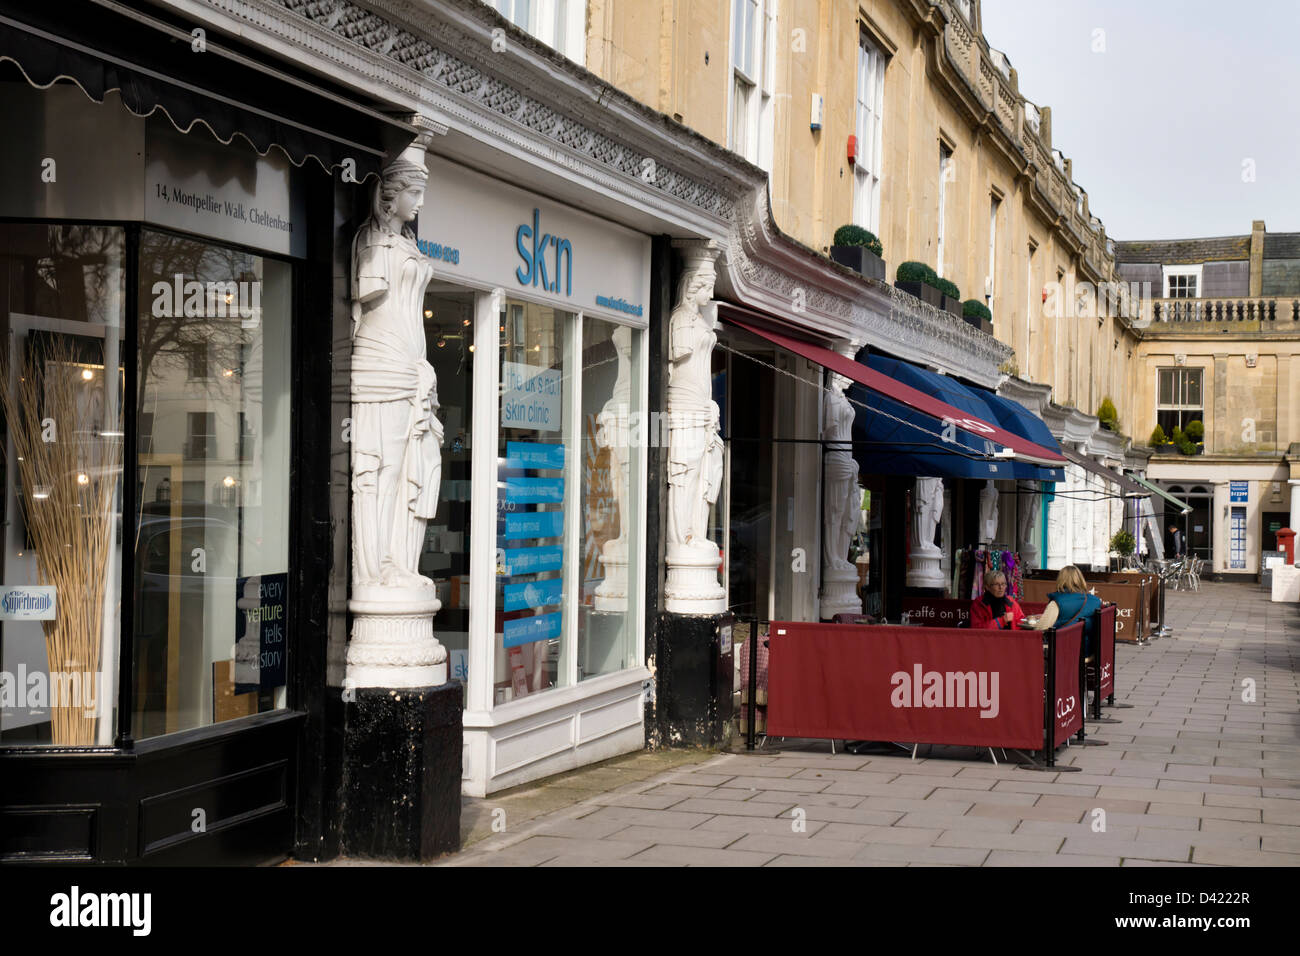 Montpellier Walk Shop fronts in Cheltenham Gloucestershire - Stock Image